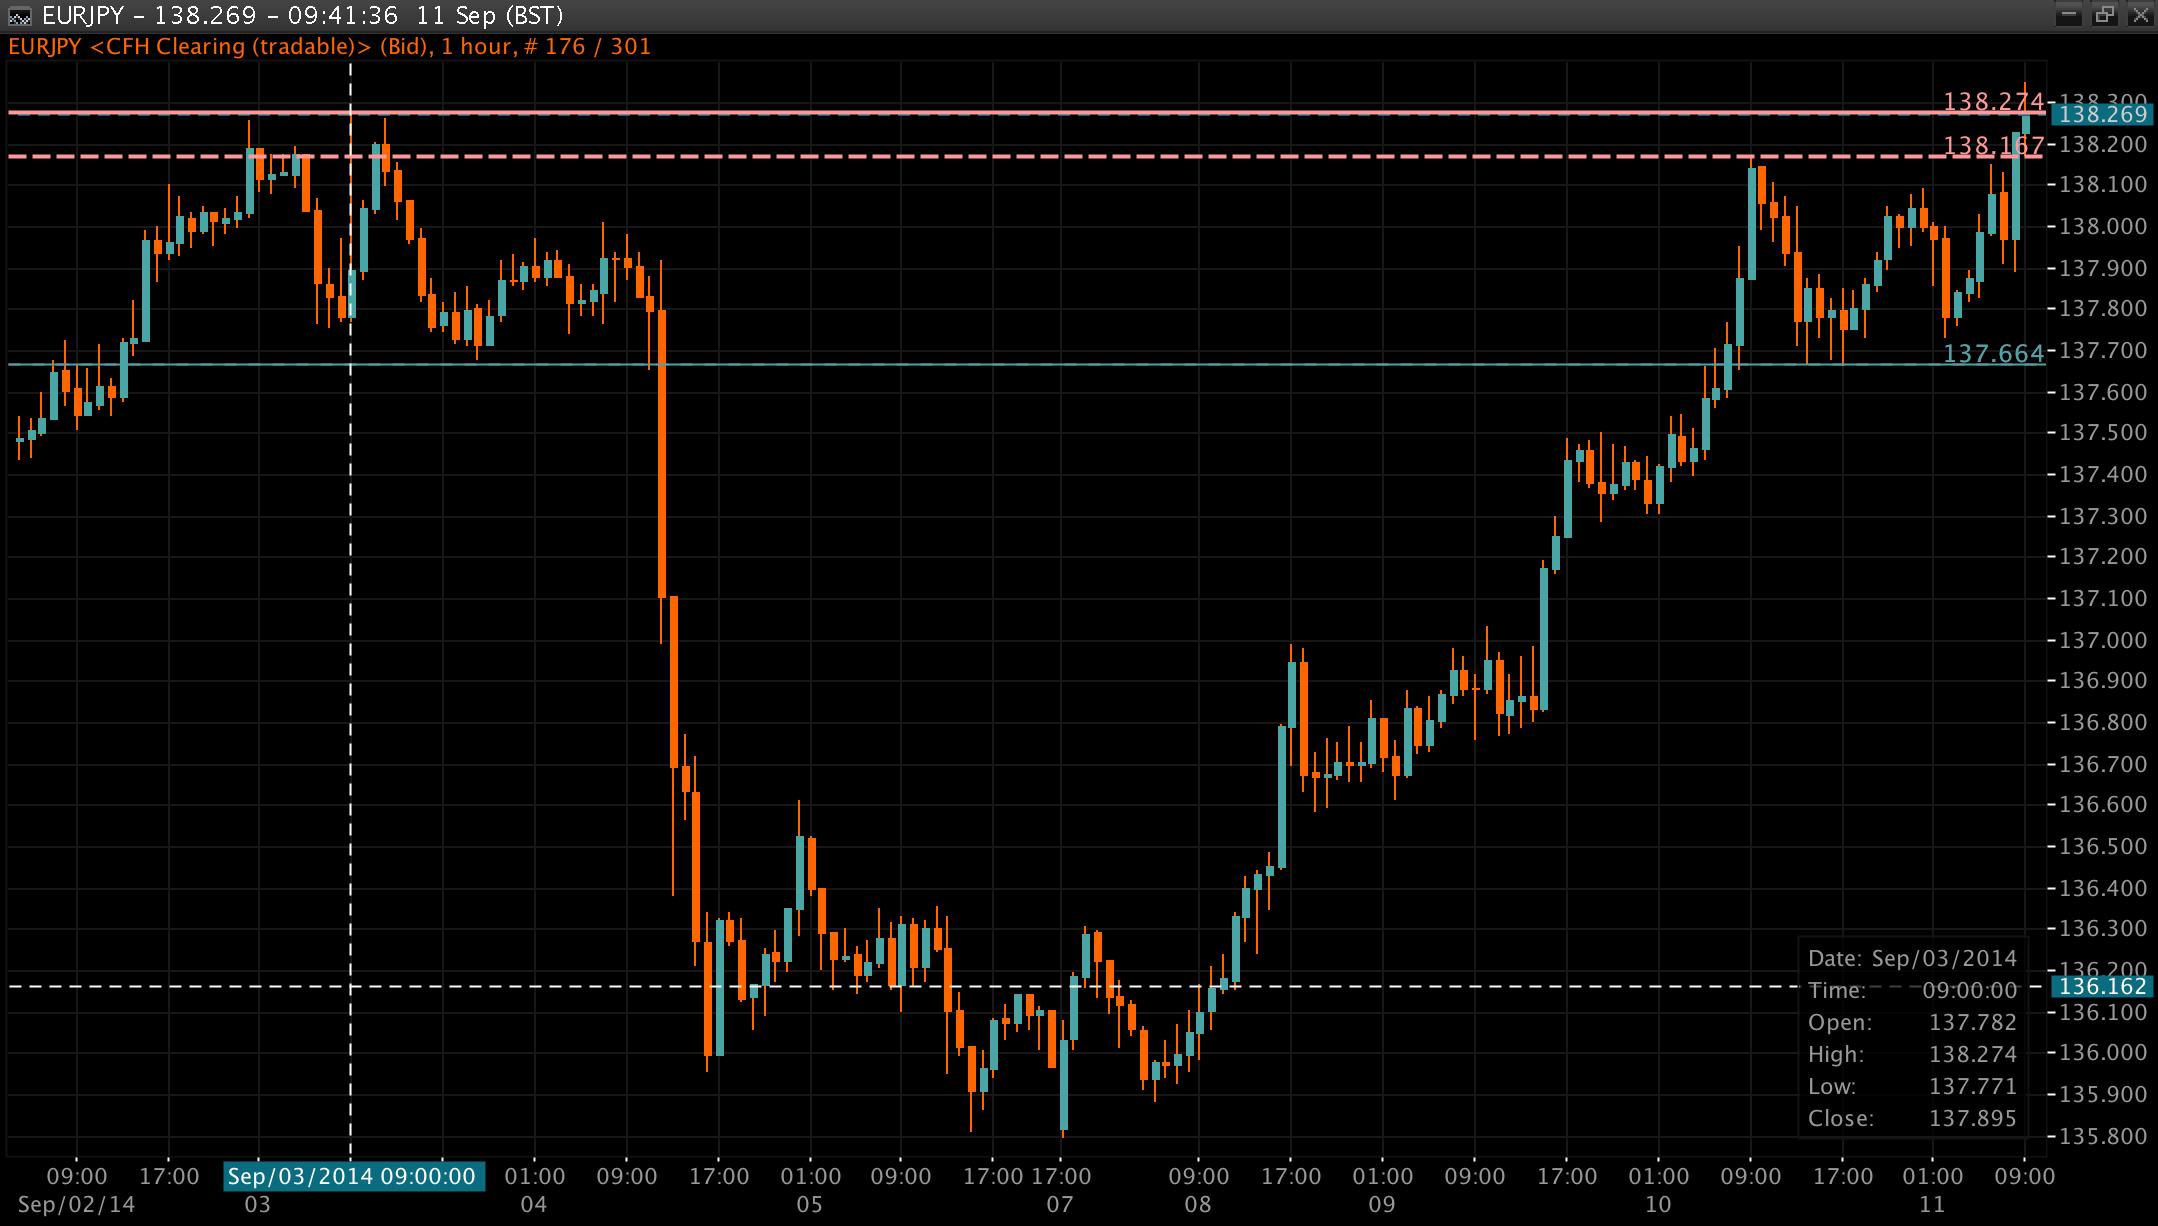 EUR/JPY Chart 11 Sep 2014